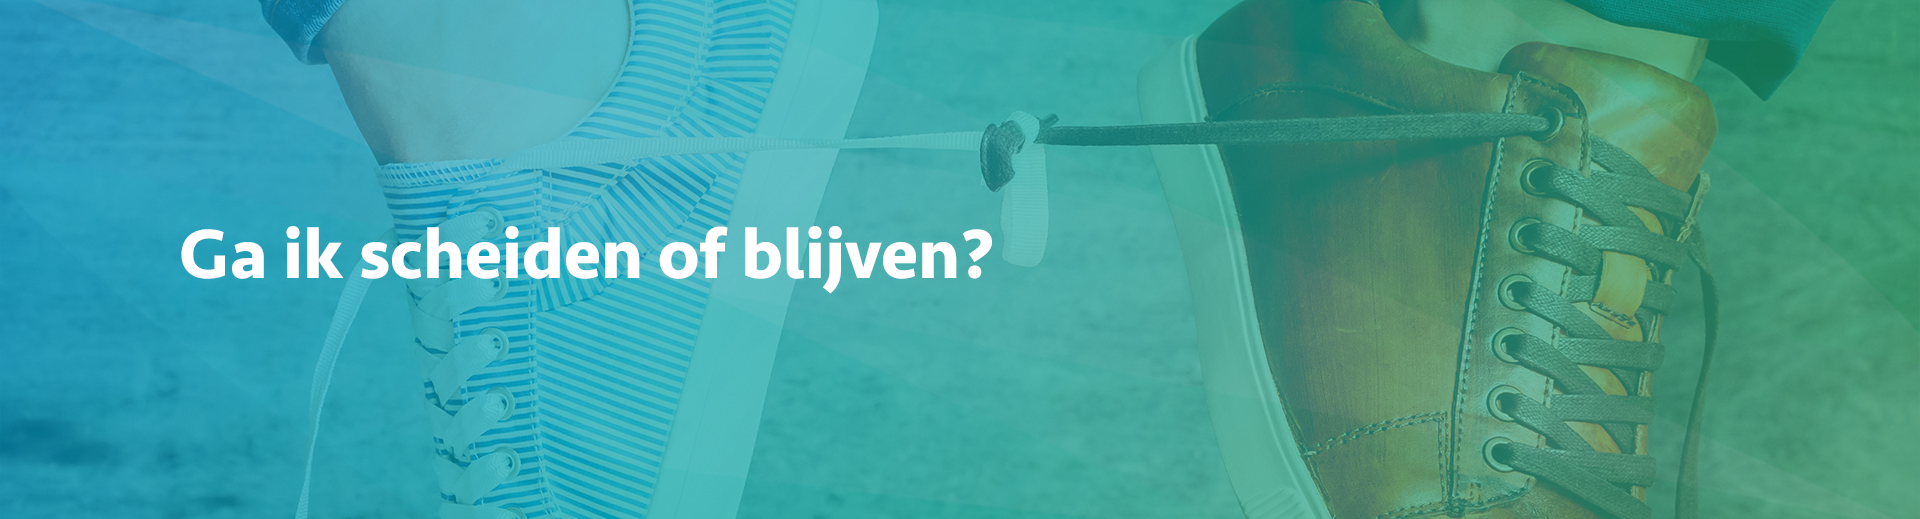 Scheiden of blijven? - Scheidingsplanner Almelo - Deventer - Nijverdal